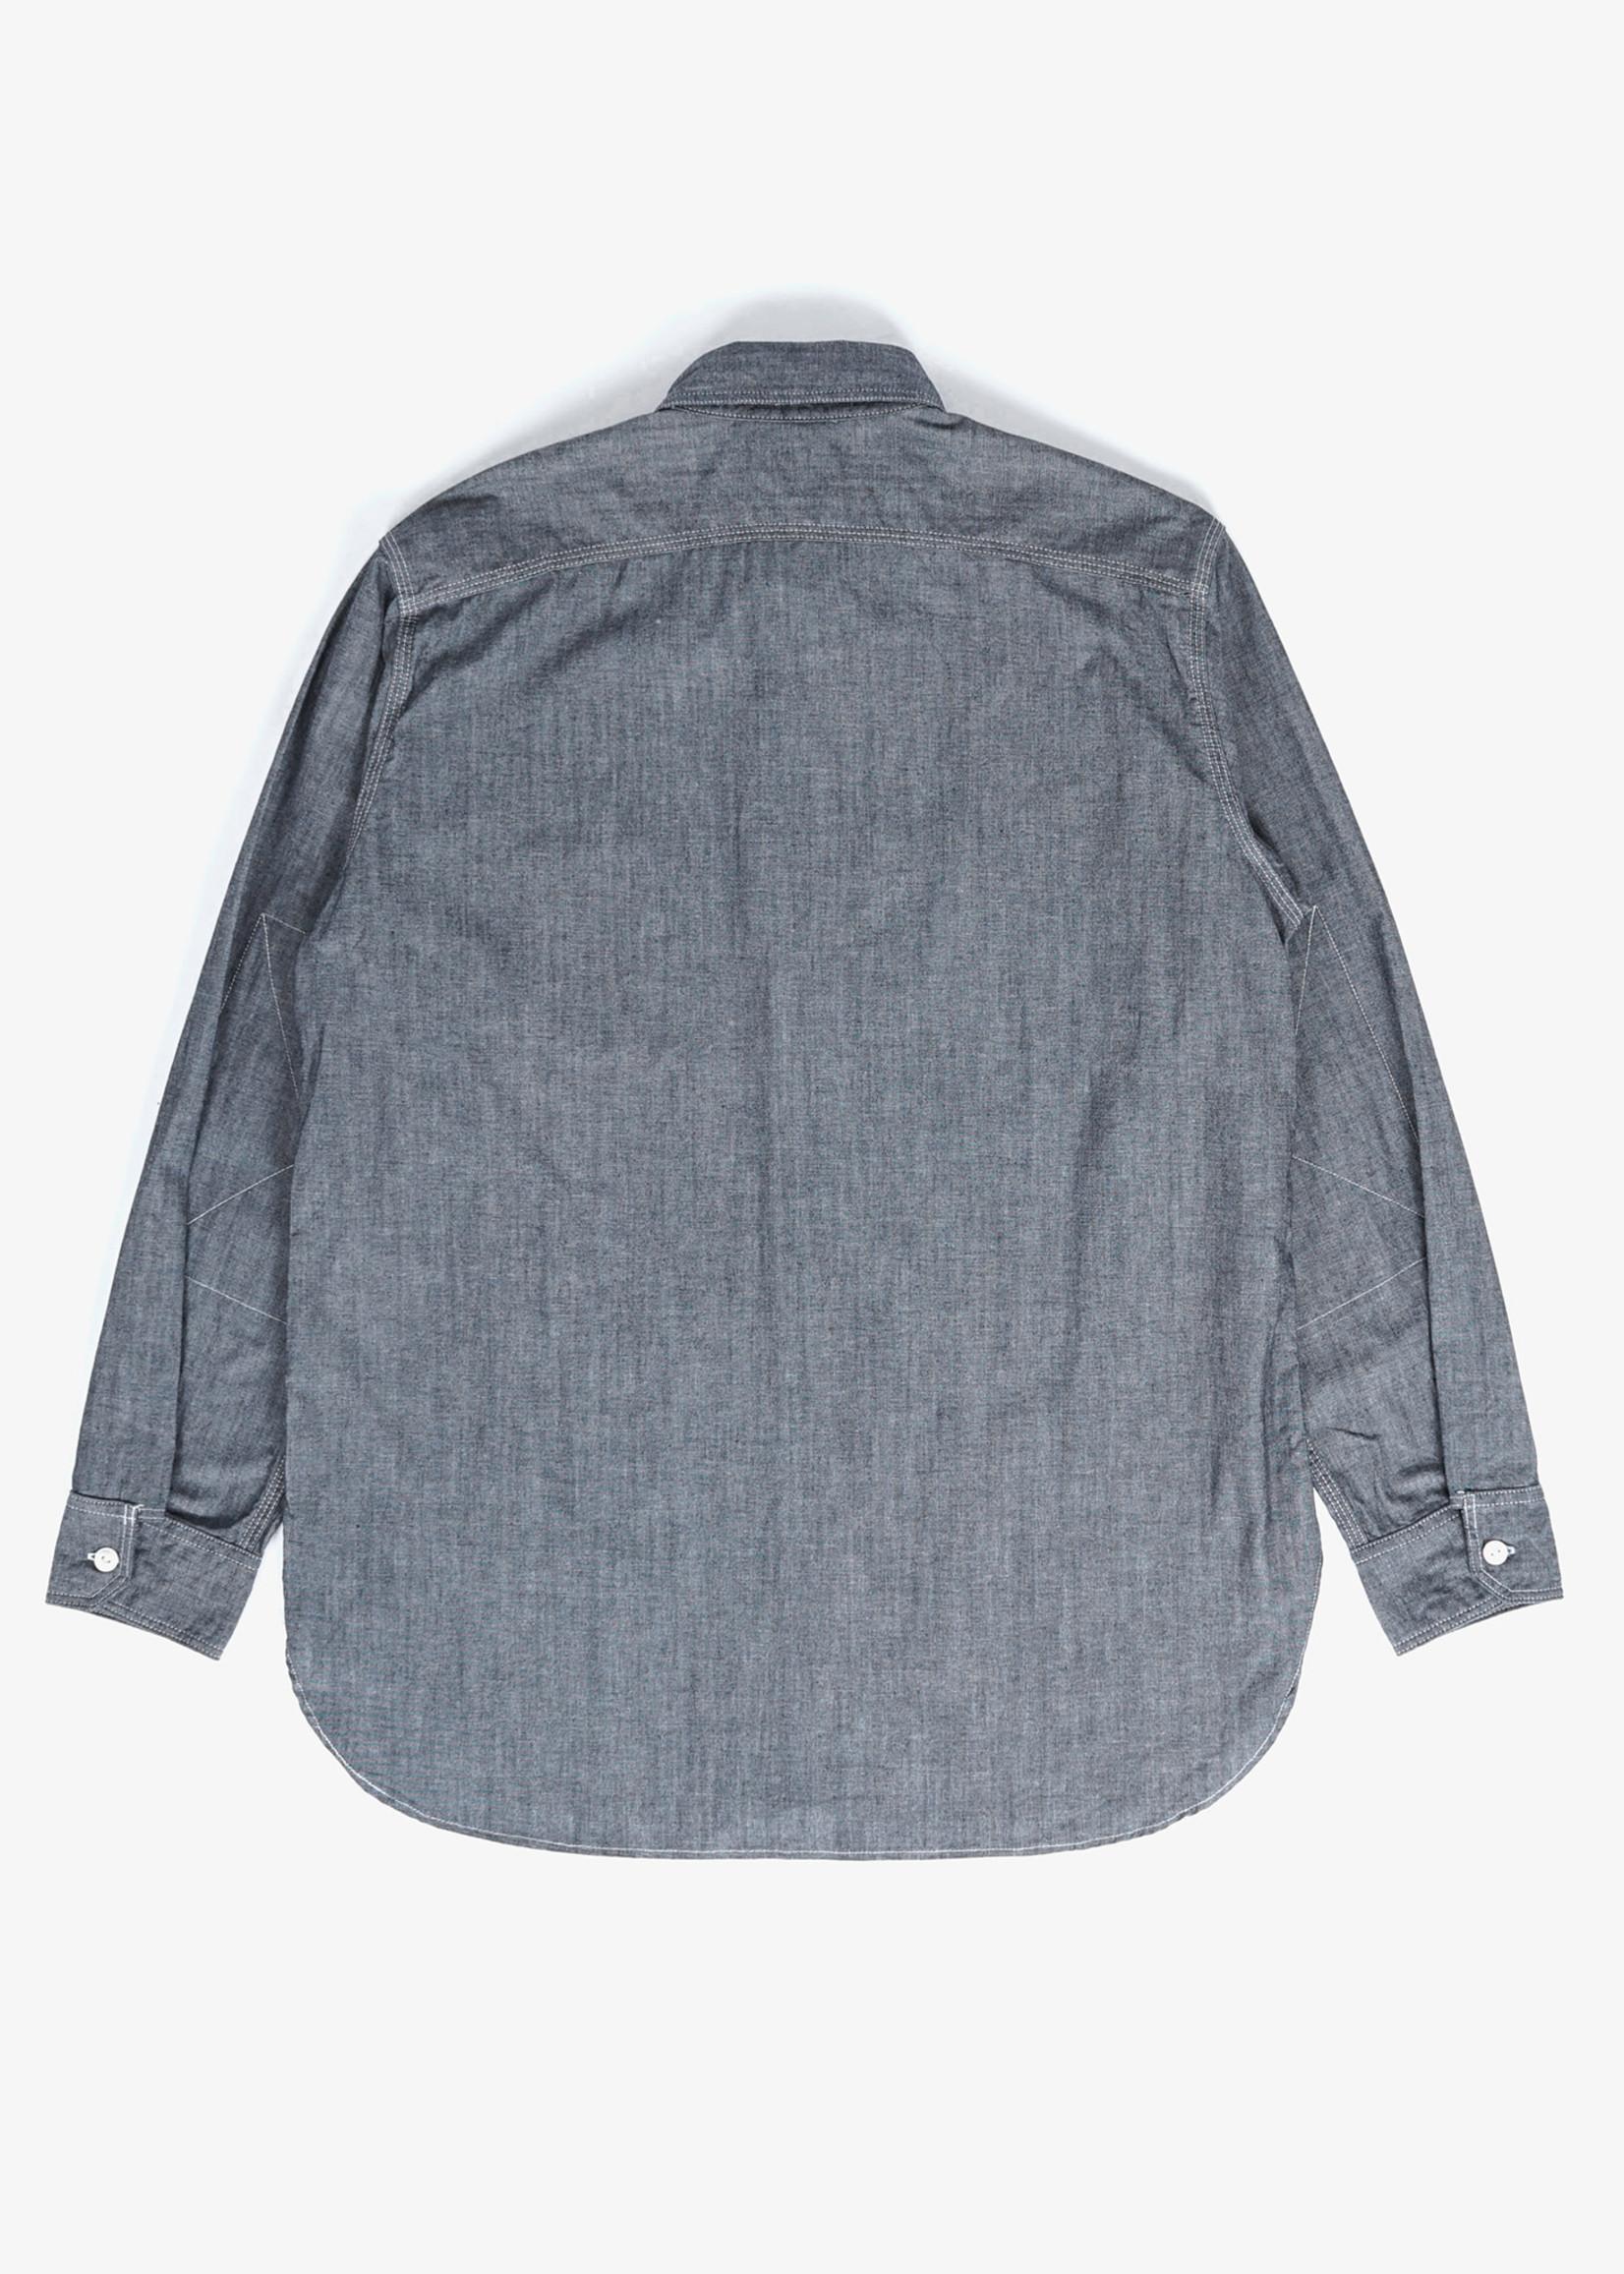 Engineered Garments  Engineered Garments Work Shirt Indigo Cotton Chambray